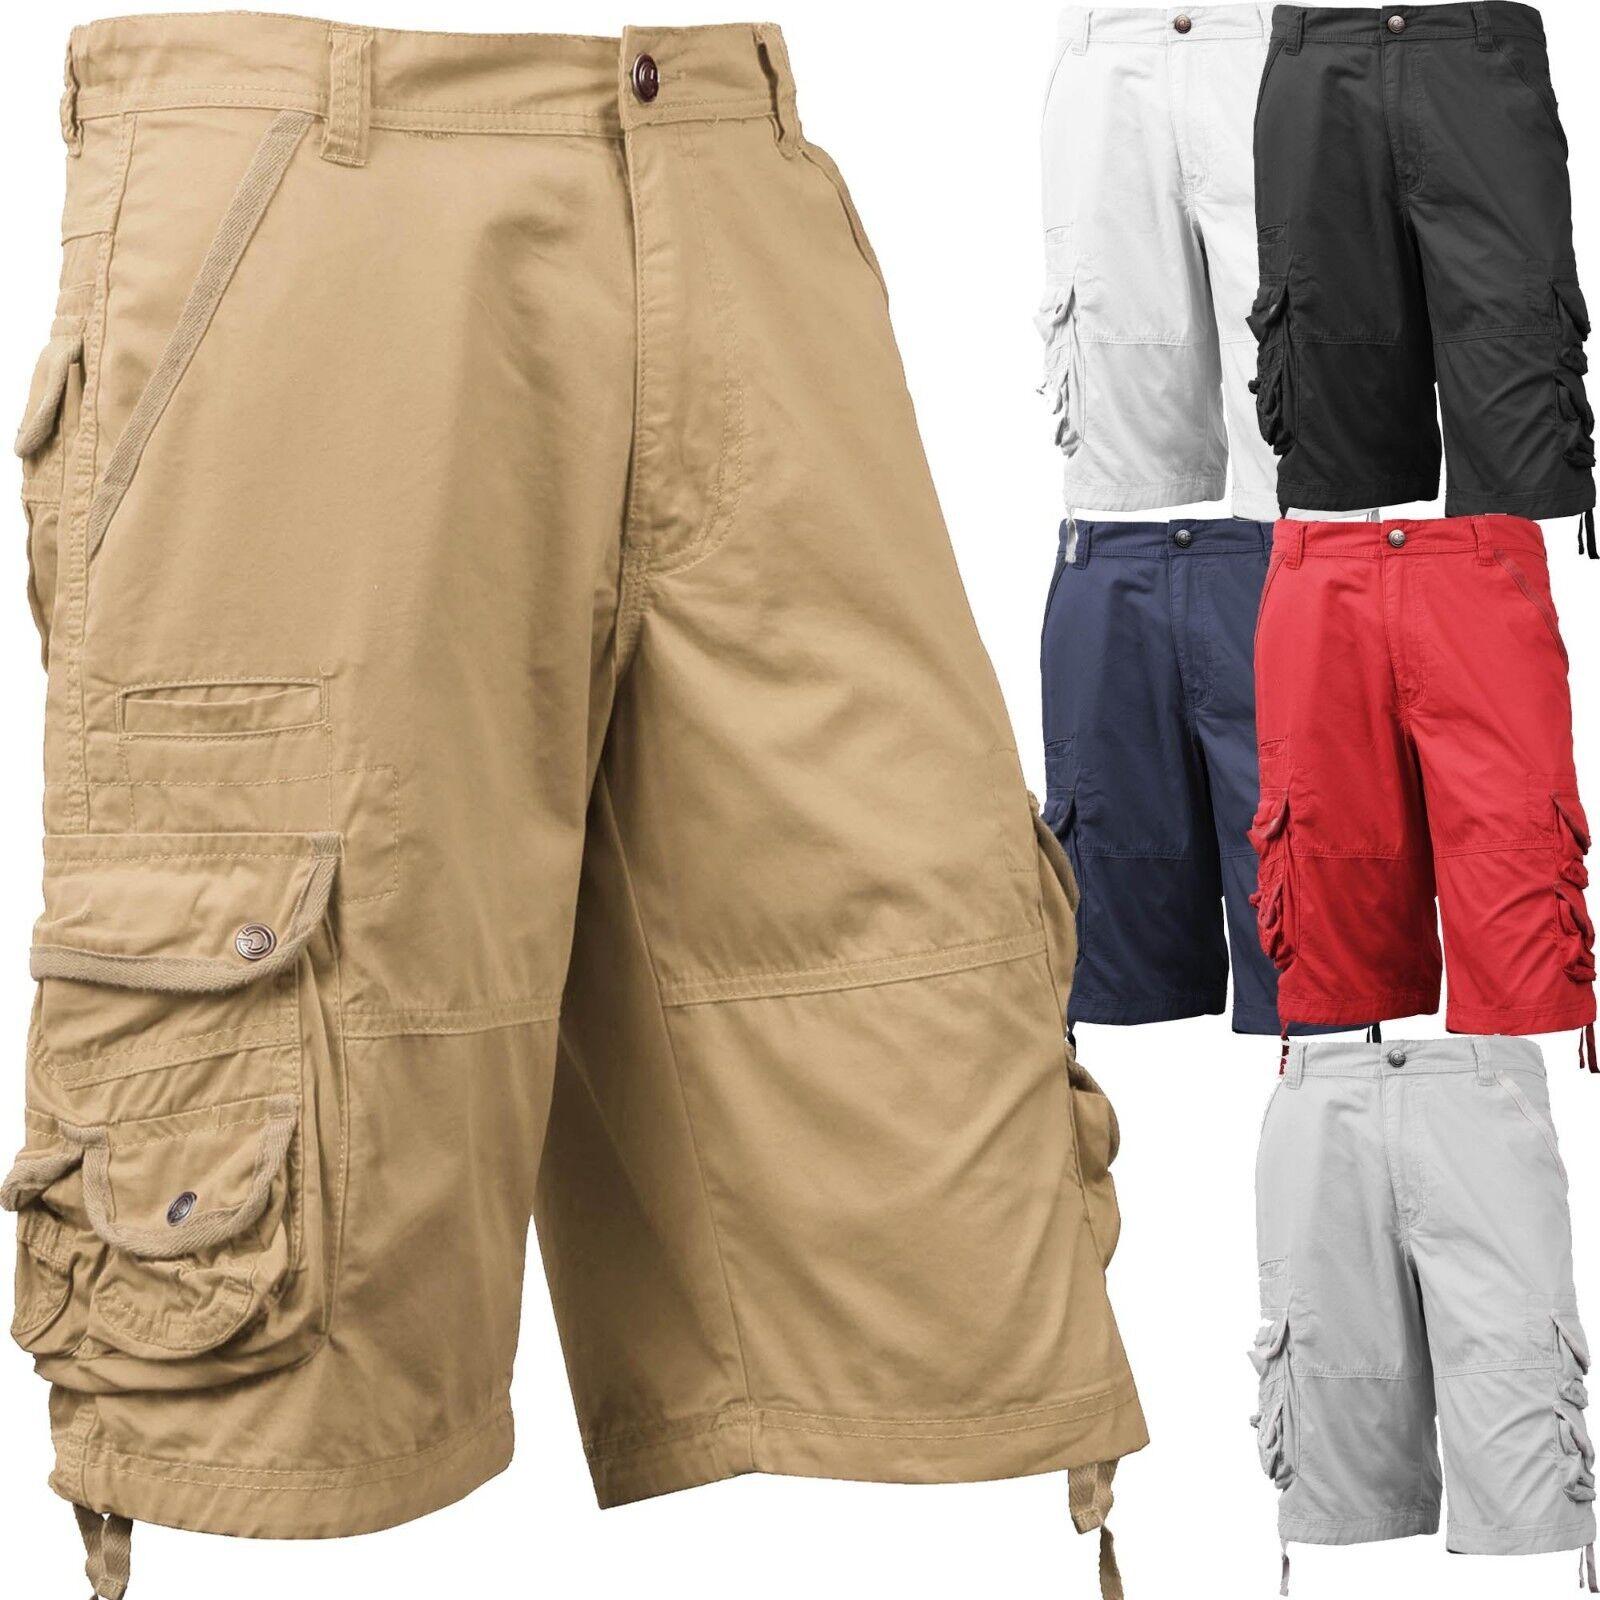 Mens Cargo Shorts Casual Multi Pocket Short Twill Cotton Pan